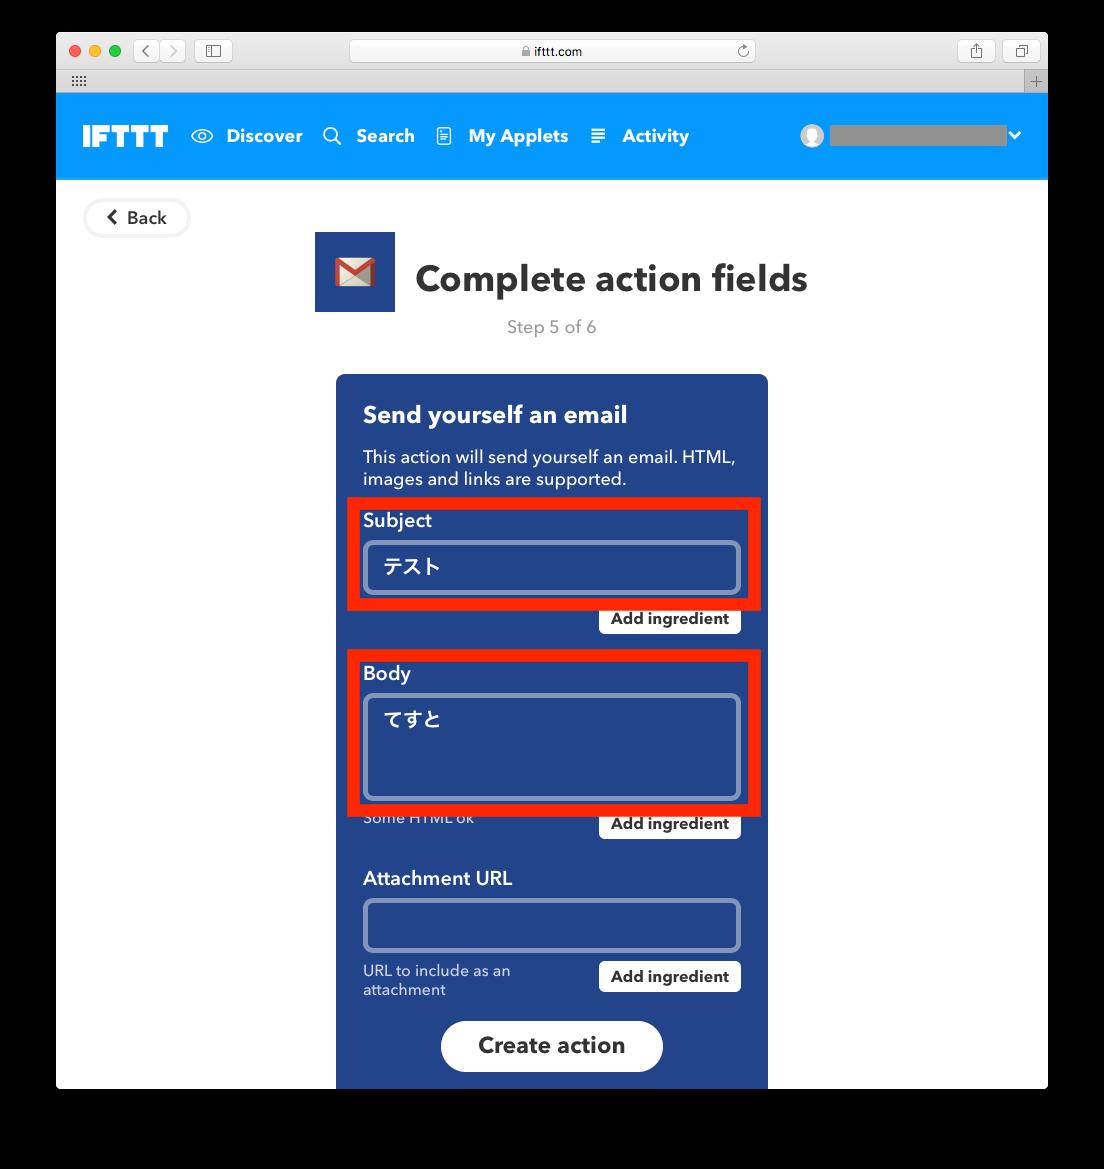 IFTTT_CompleteActionFields.png